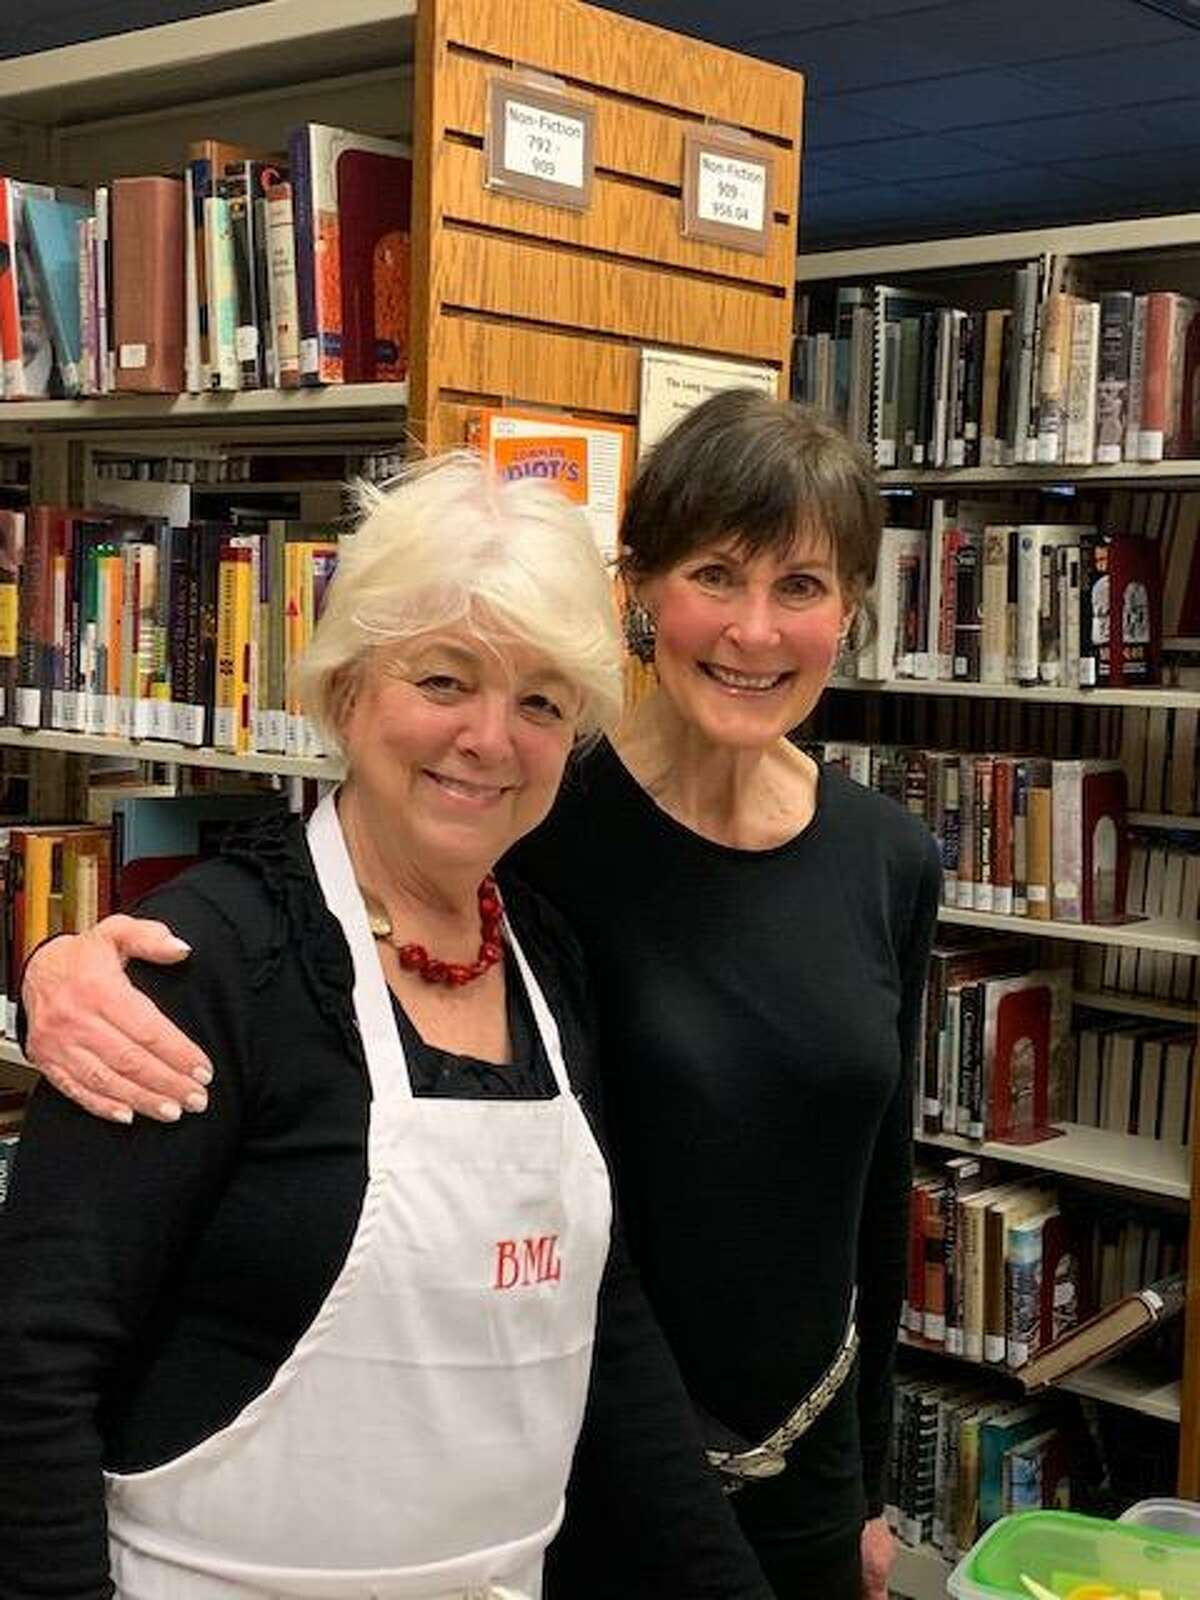 Volunteers Elizabeth Adams and Debbie Karpf were among a dozen who helped make Brainerd Memorial Library's volunteer event a success.